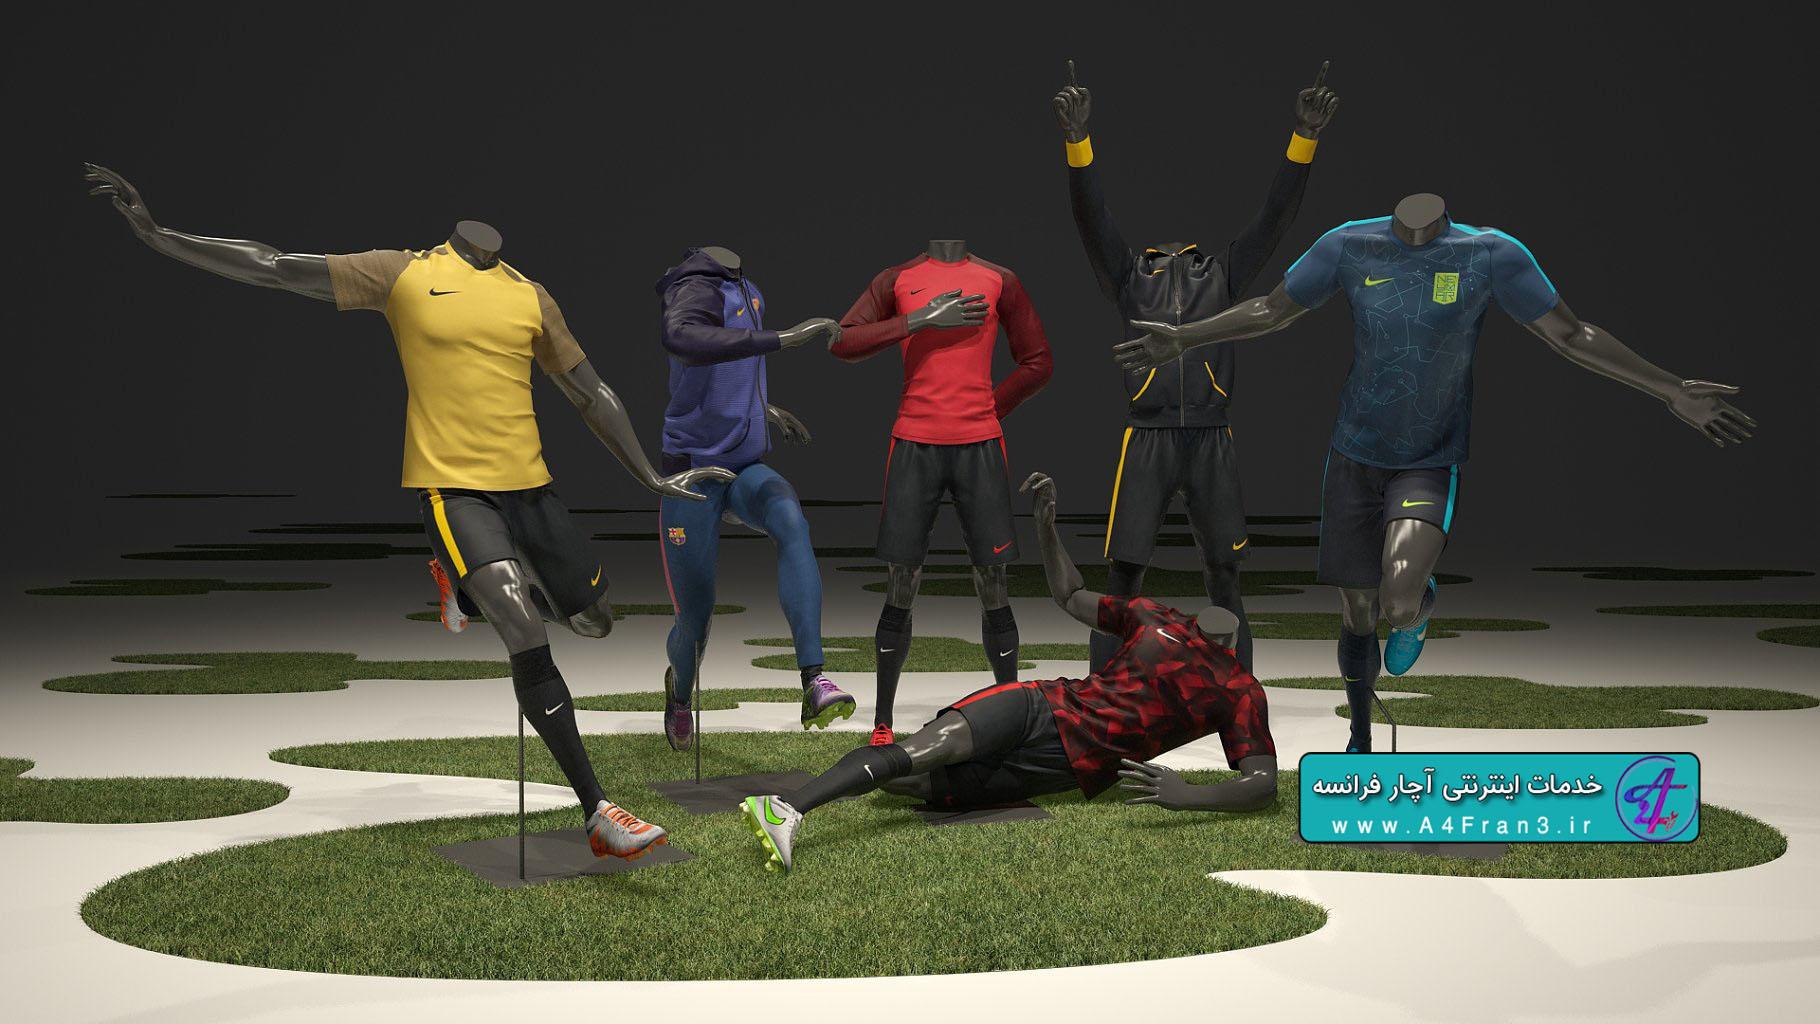 دانلود مدل سه بعدی فوتبال نایکی MALE MANNEQUIN NIKE FOOTBALL